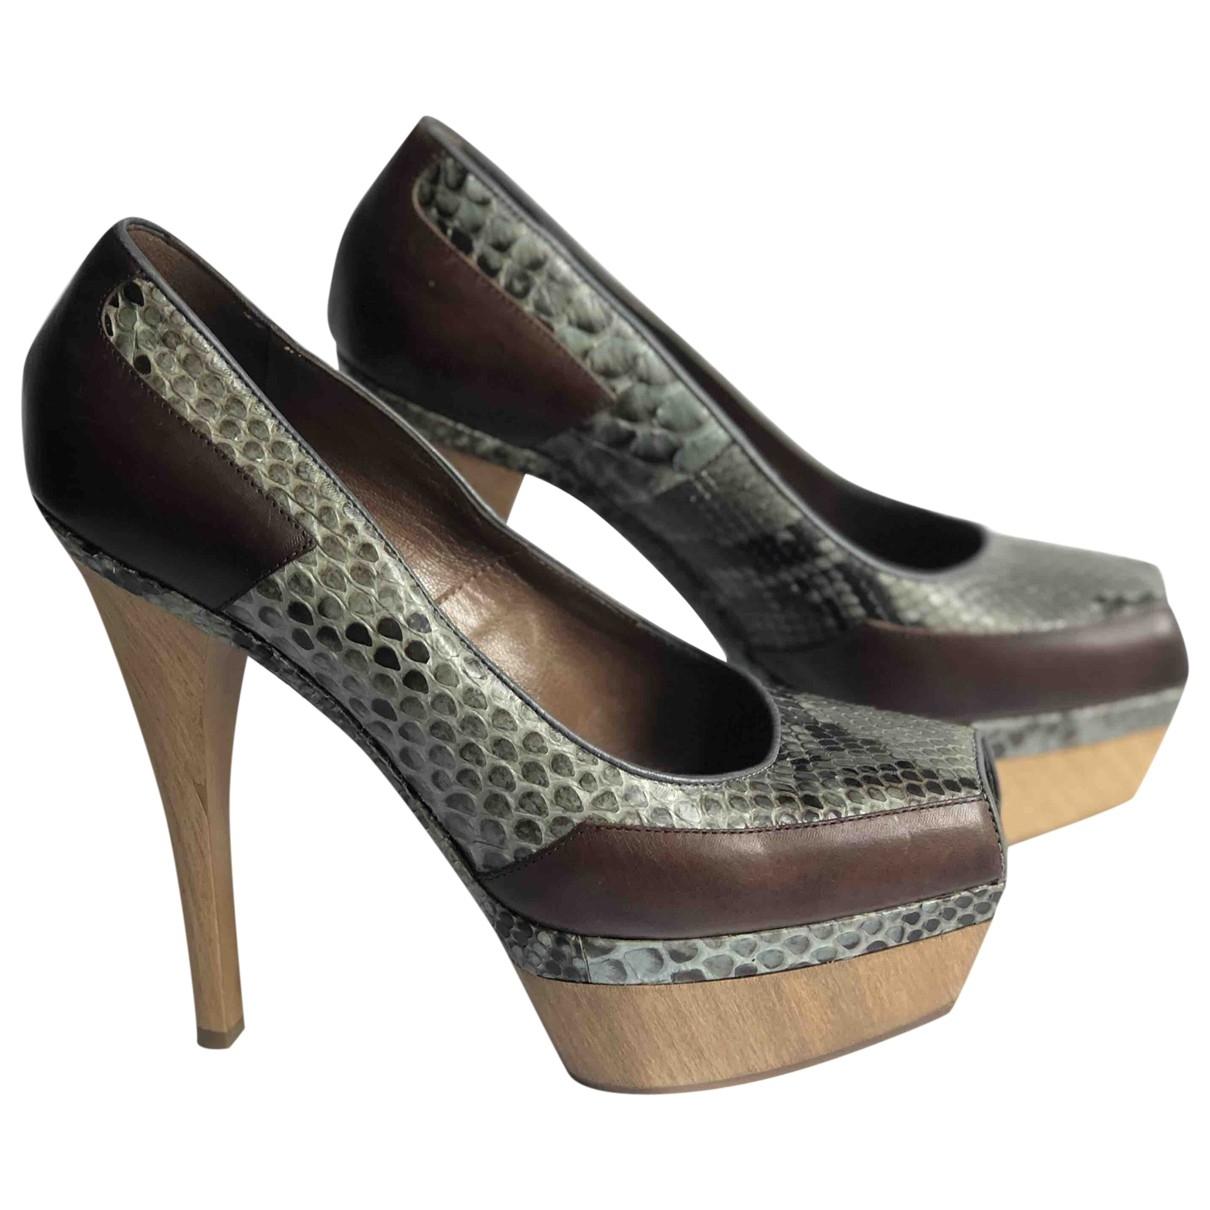 Marni \N Multicolour Leather Heels for Women 38 EU